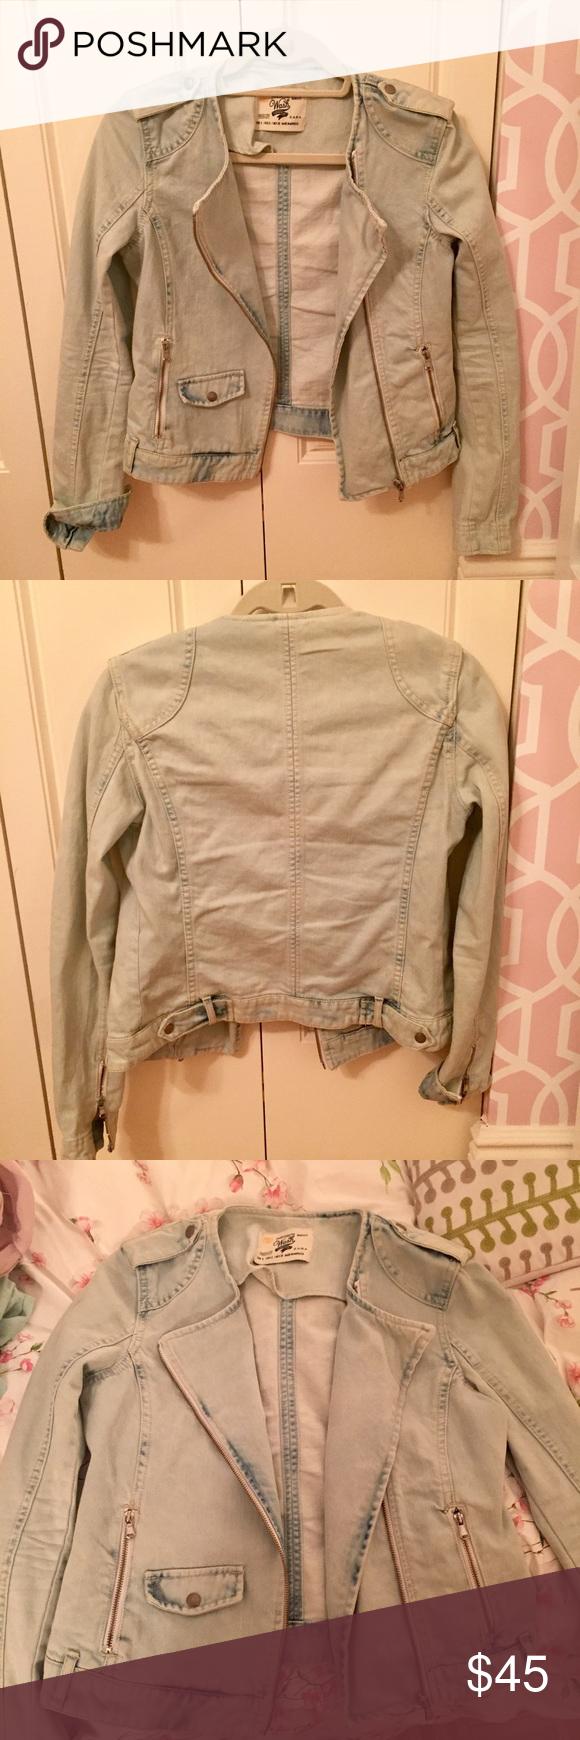 Zara Denim Jacket Amazing Zara light denim jacket! So cute! Worn once. Size small. Zara Jackets & Coats Jean Jackets